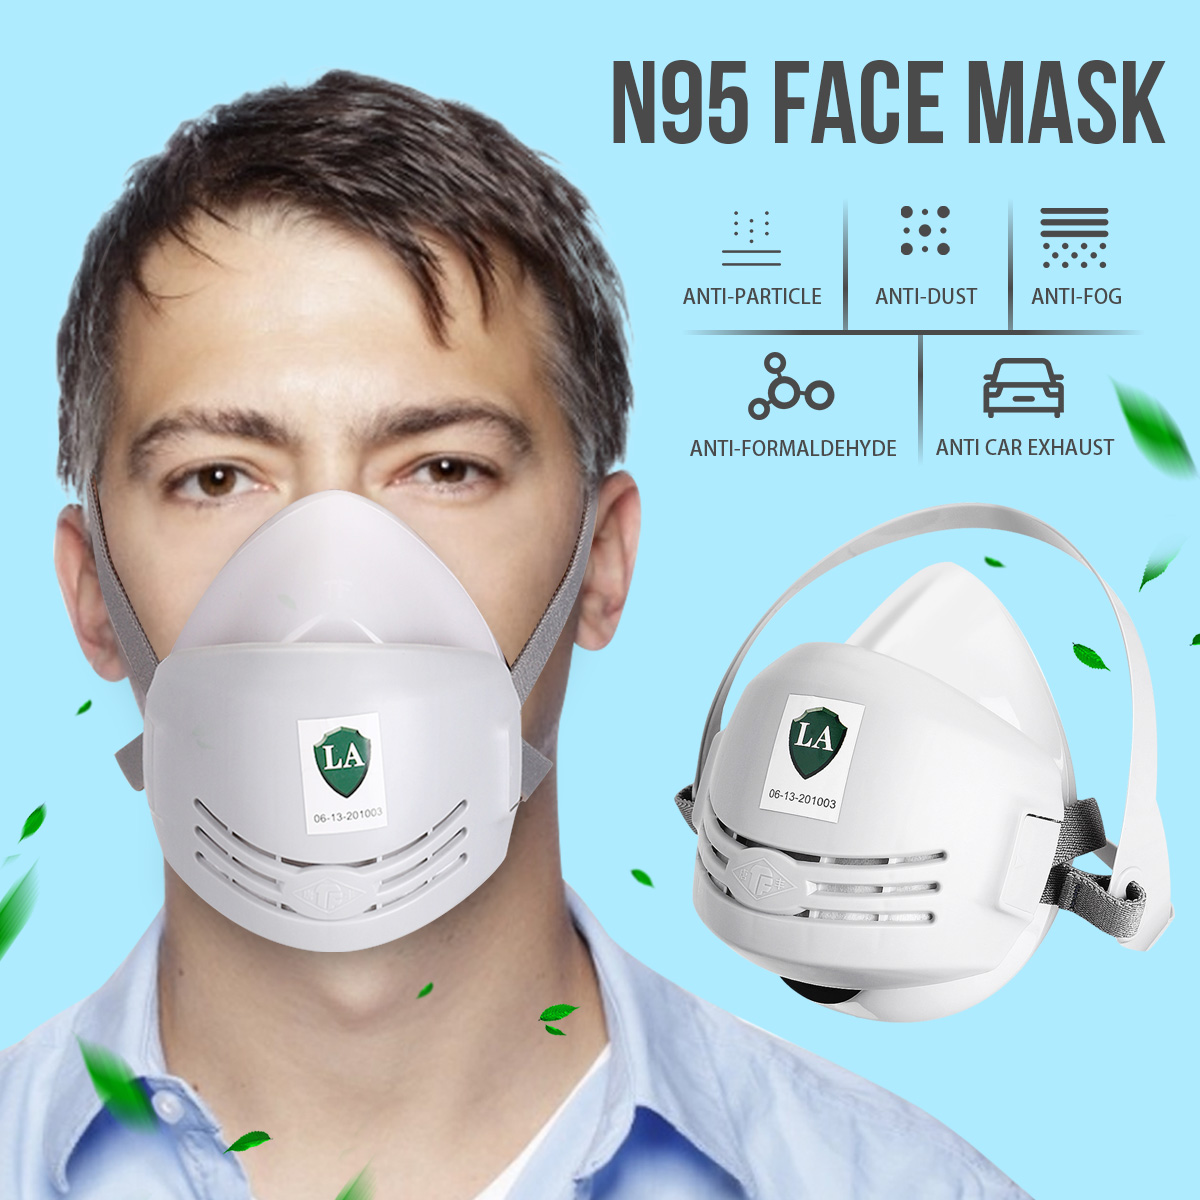 n95 respirators mask - photo #13